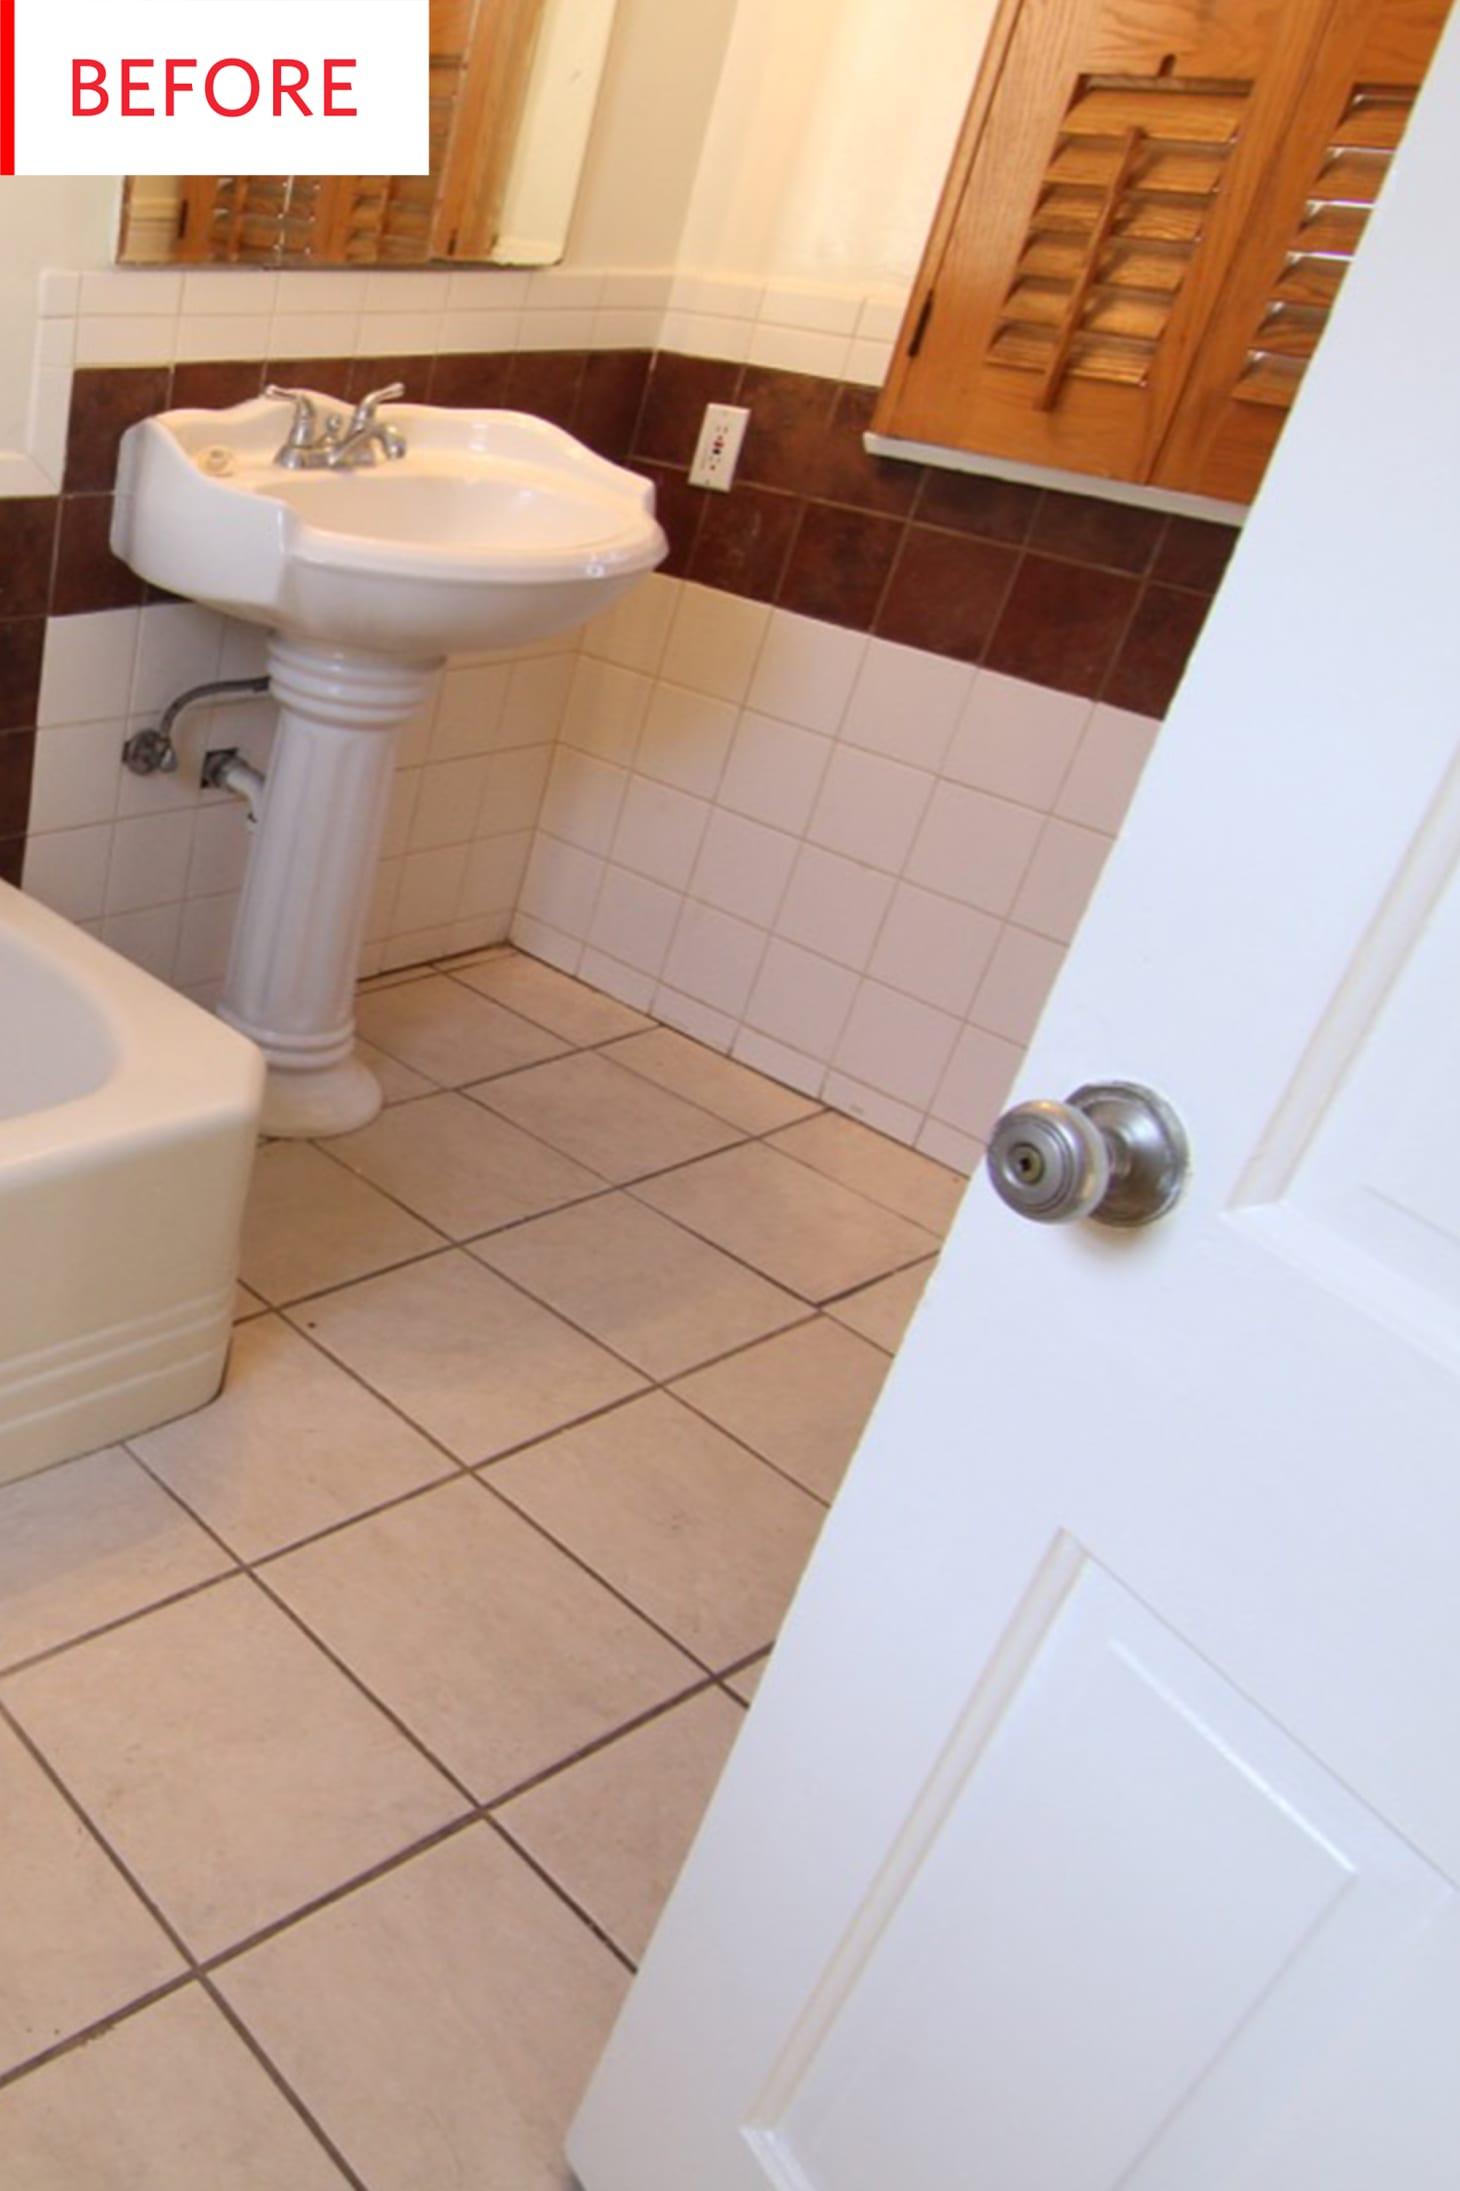 Vinyl Peel And Stick Tile Decals Bathroom Remodel